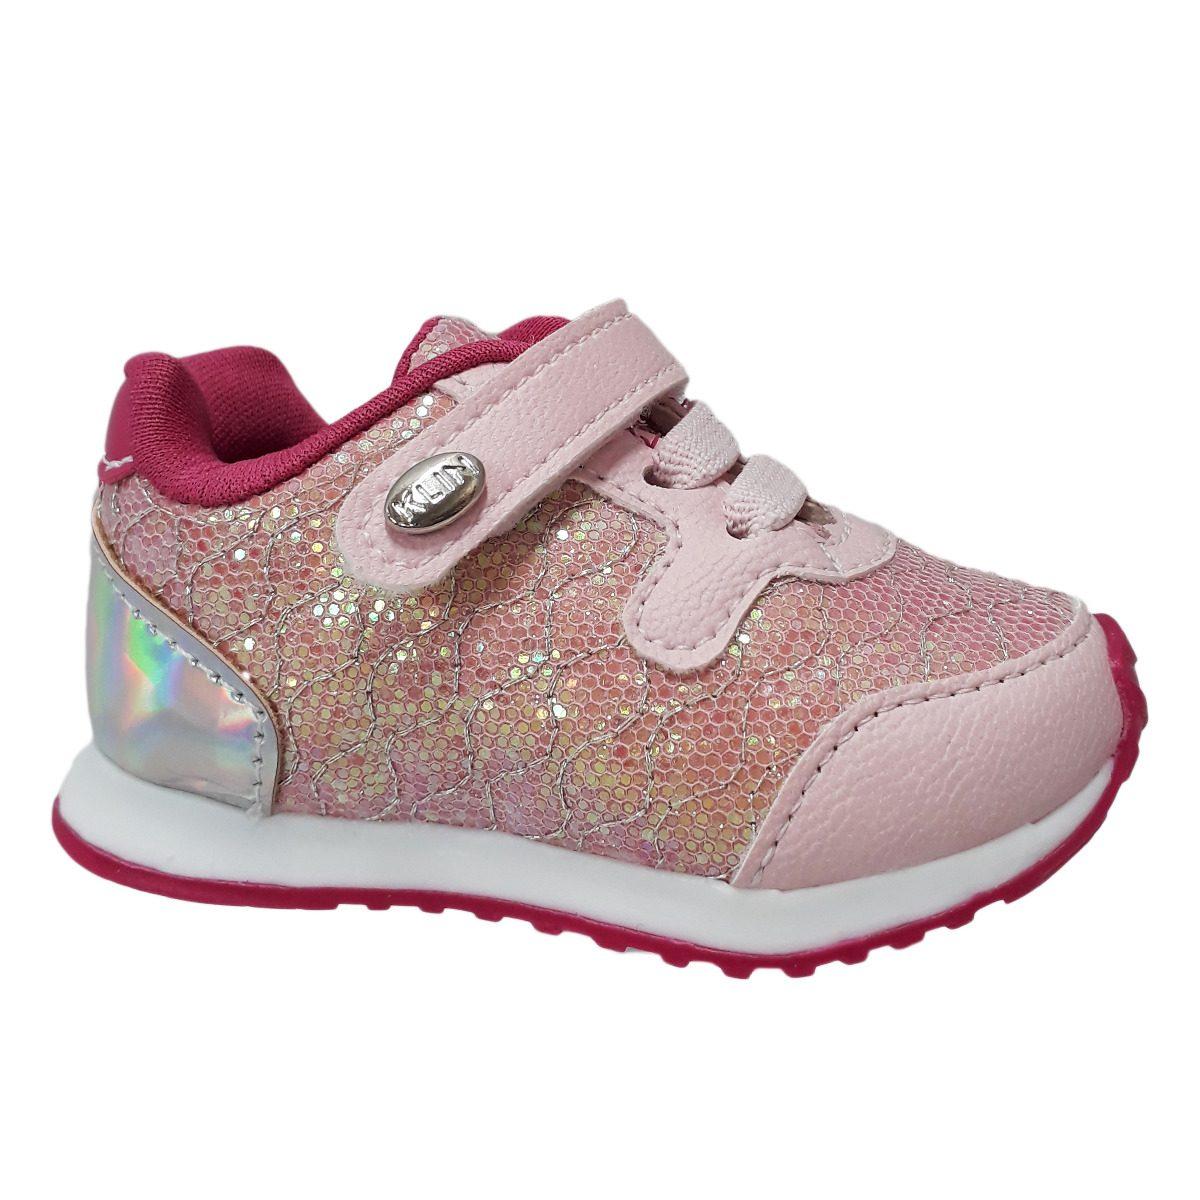 b01ec587887 Tênis Klin Menina Infantil Mini Walk Rosa Pink 453.010 - R  84